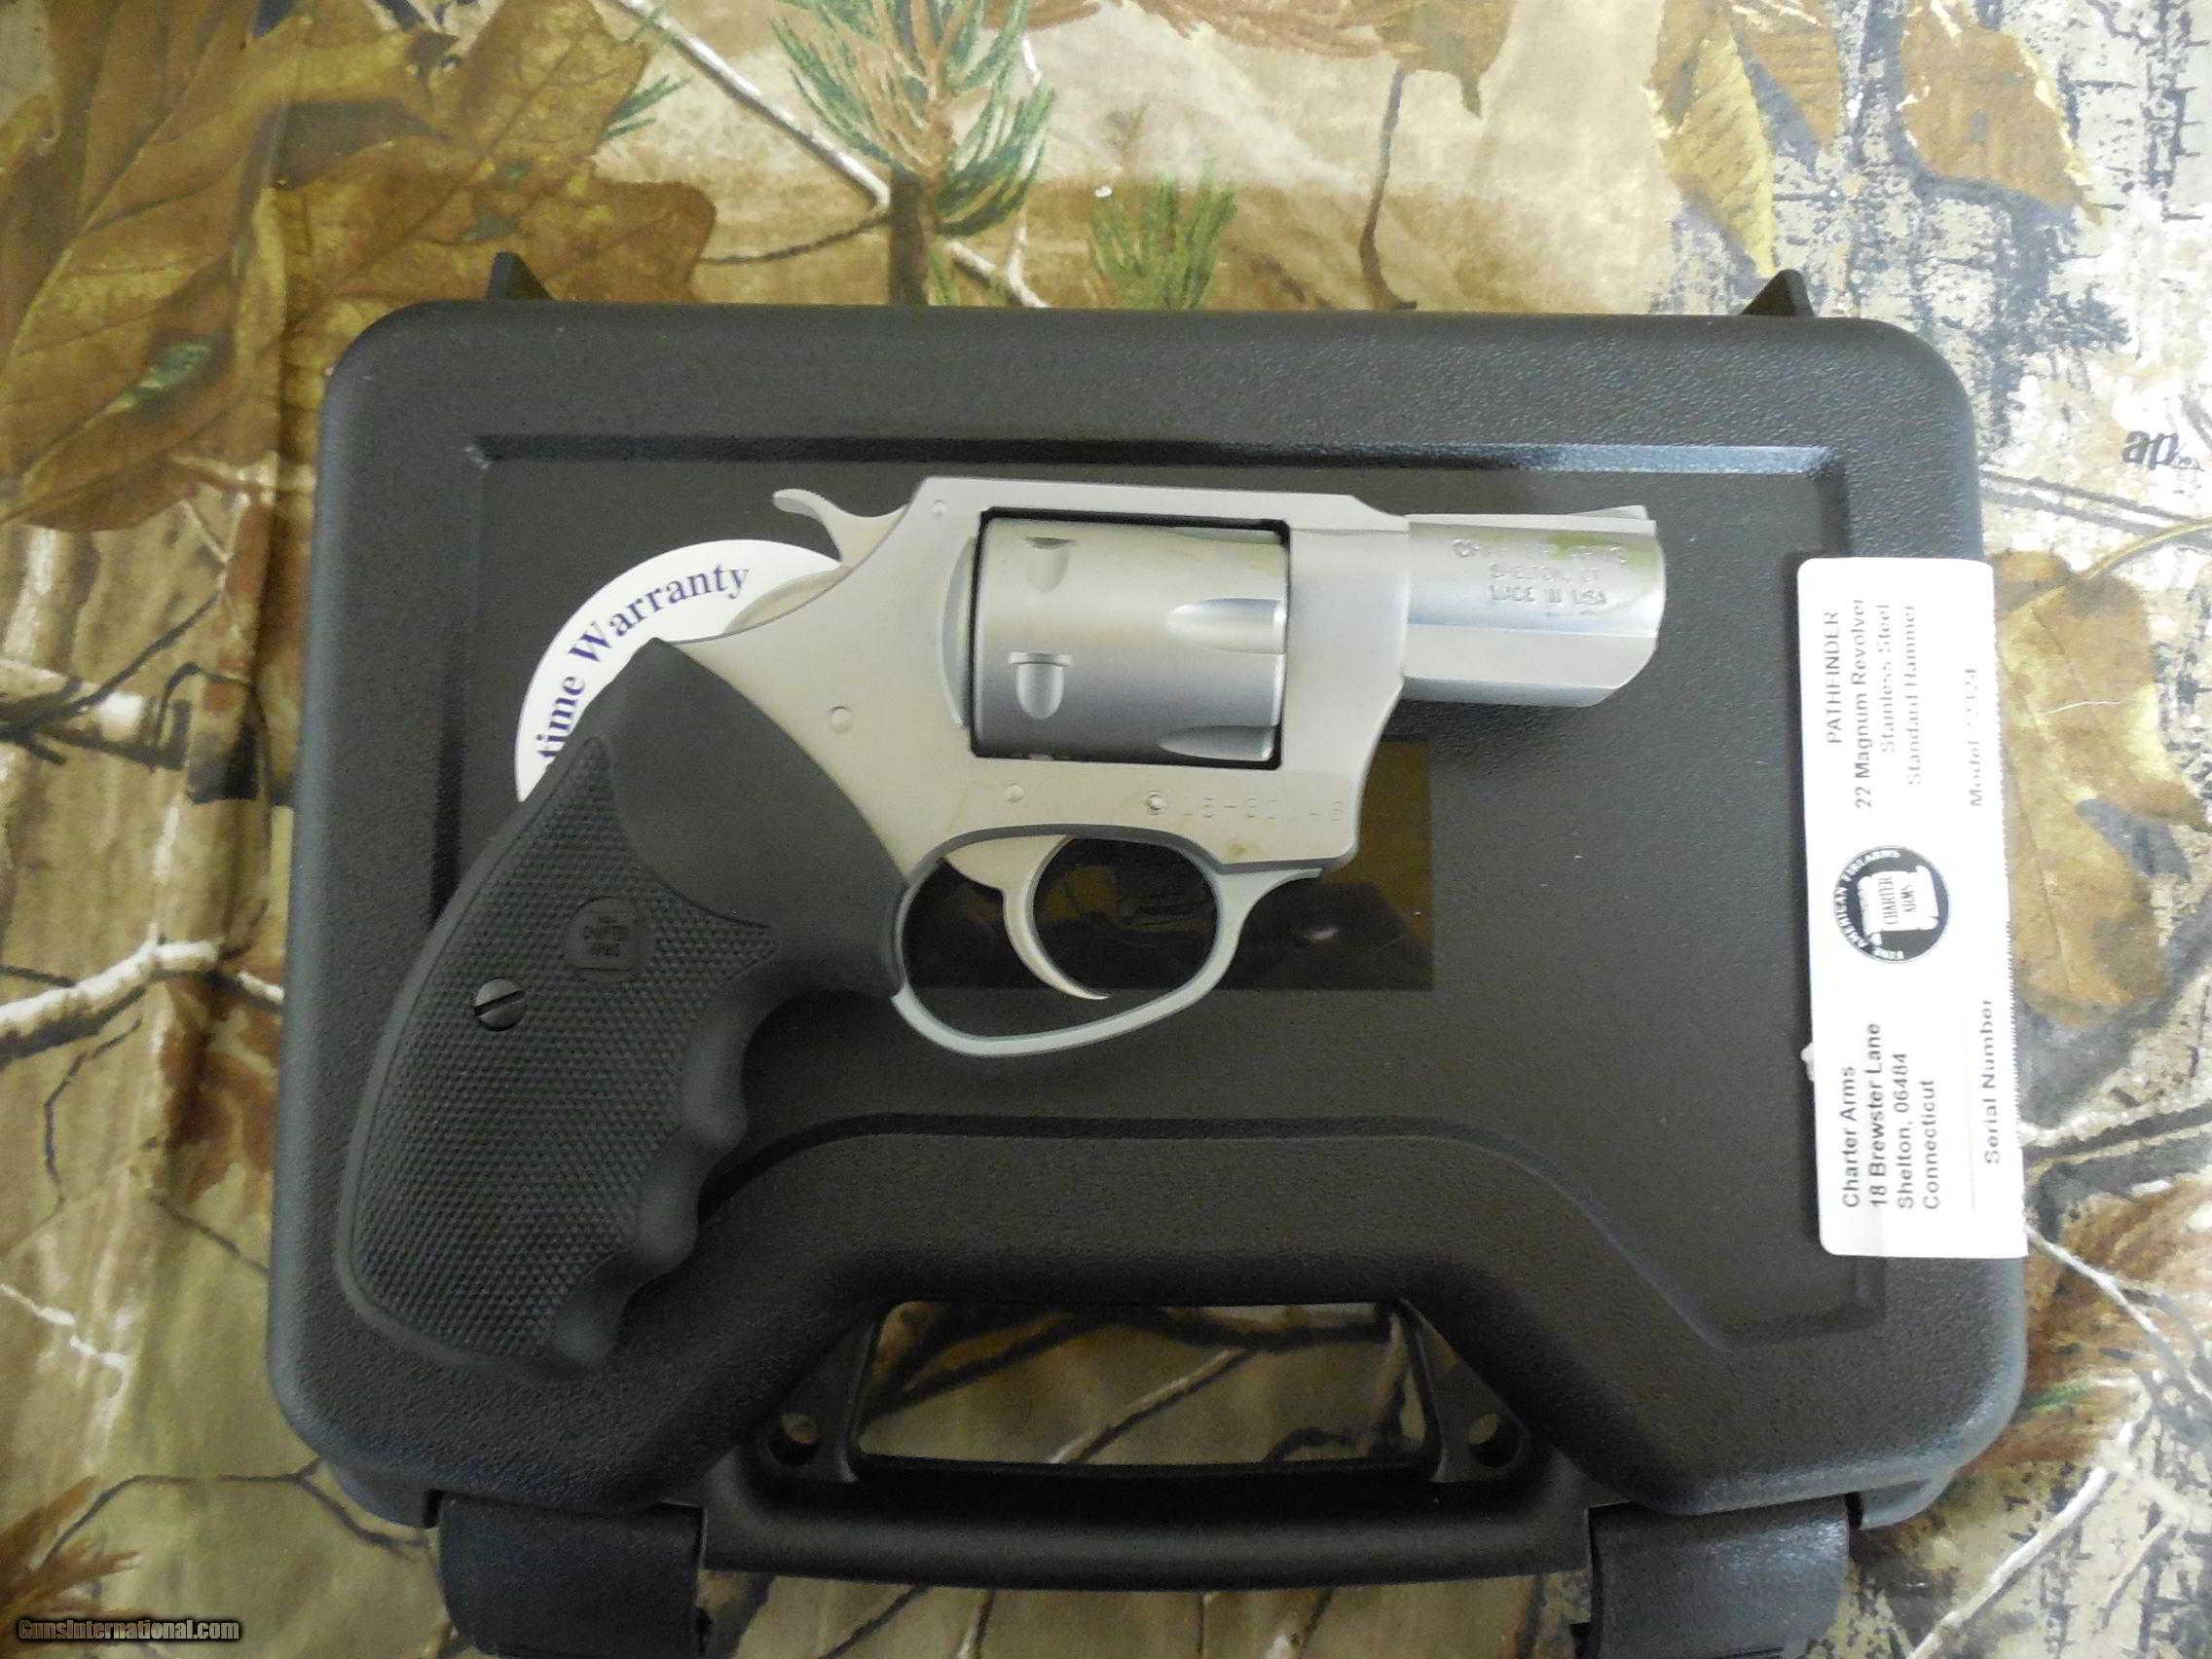 Charter Arms **ON SALE** Pathfinder 22 Magnum 2